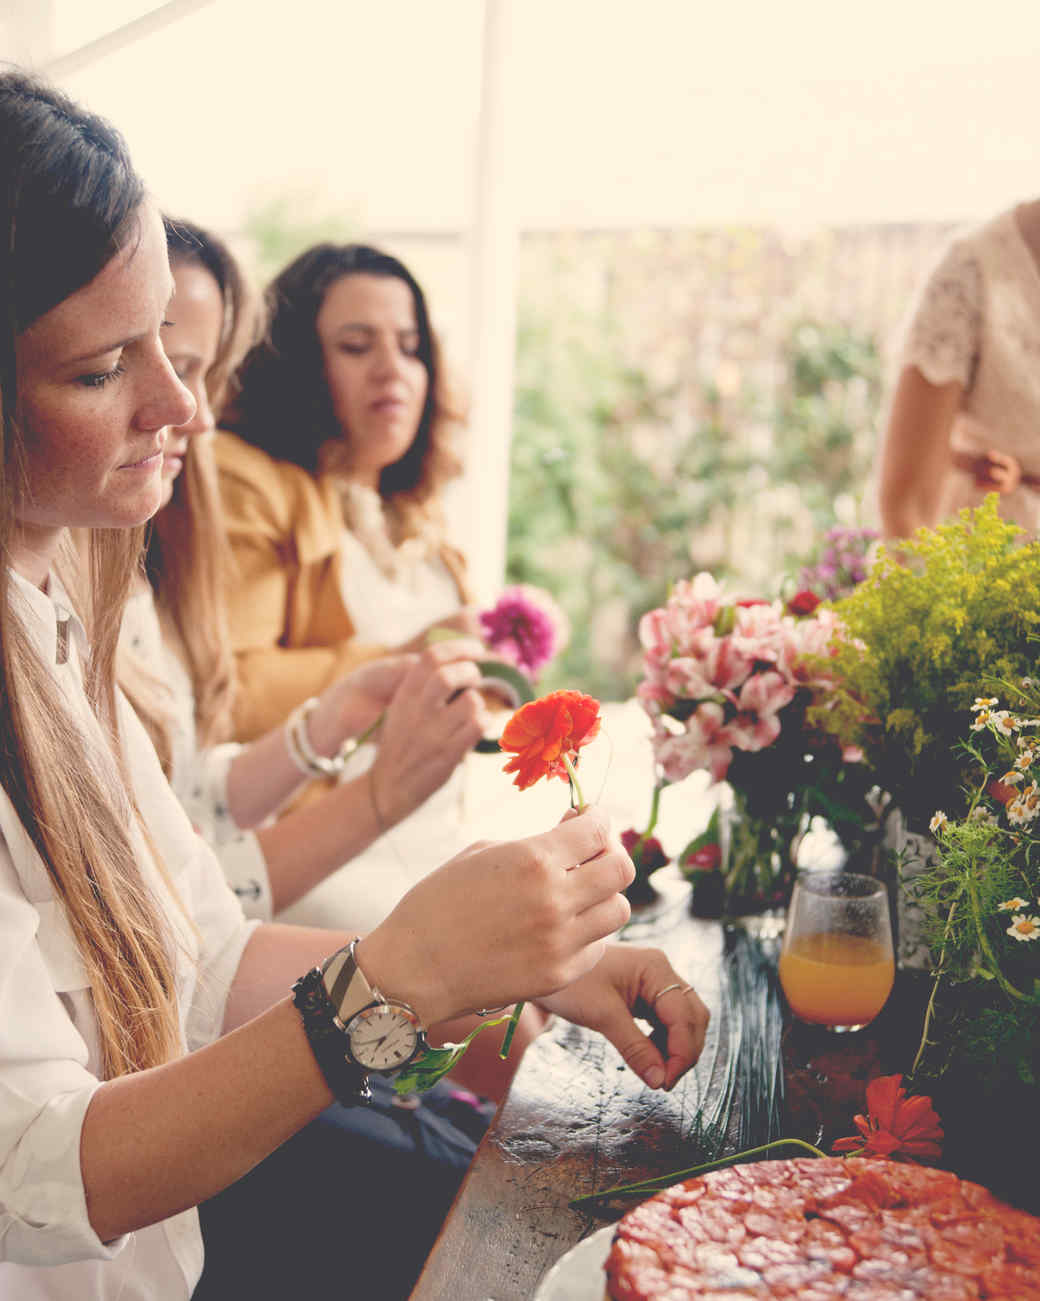 claire-thomas-bridal-shower-garden-friends-crafting-0814.jpg